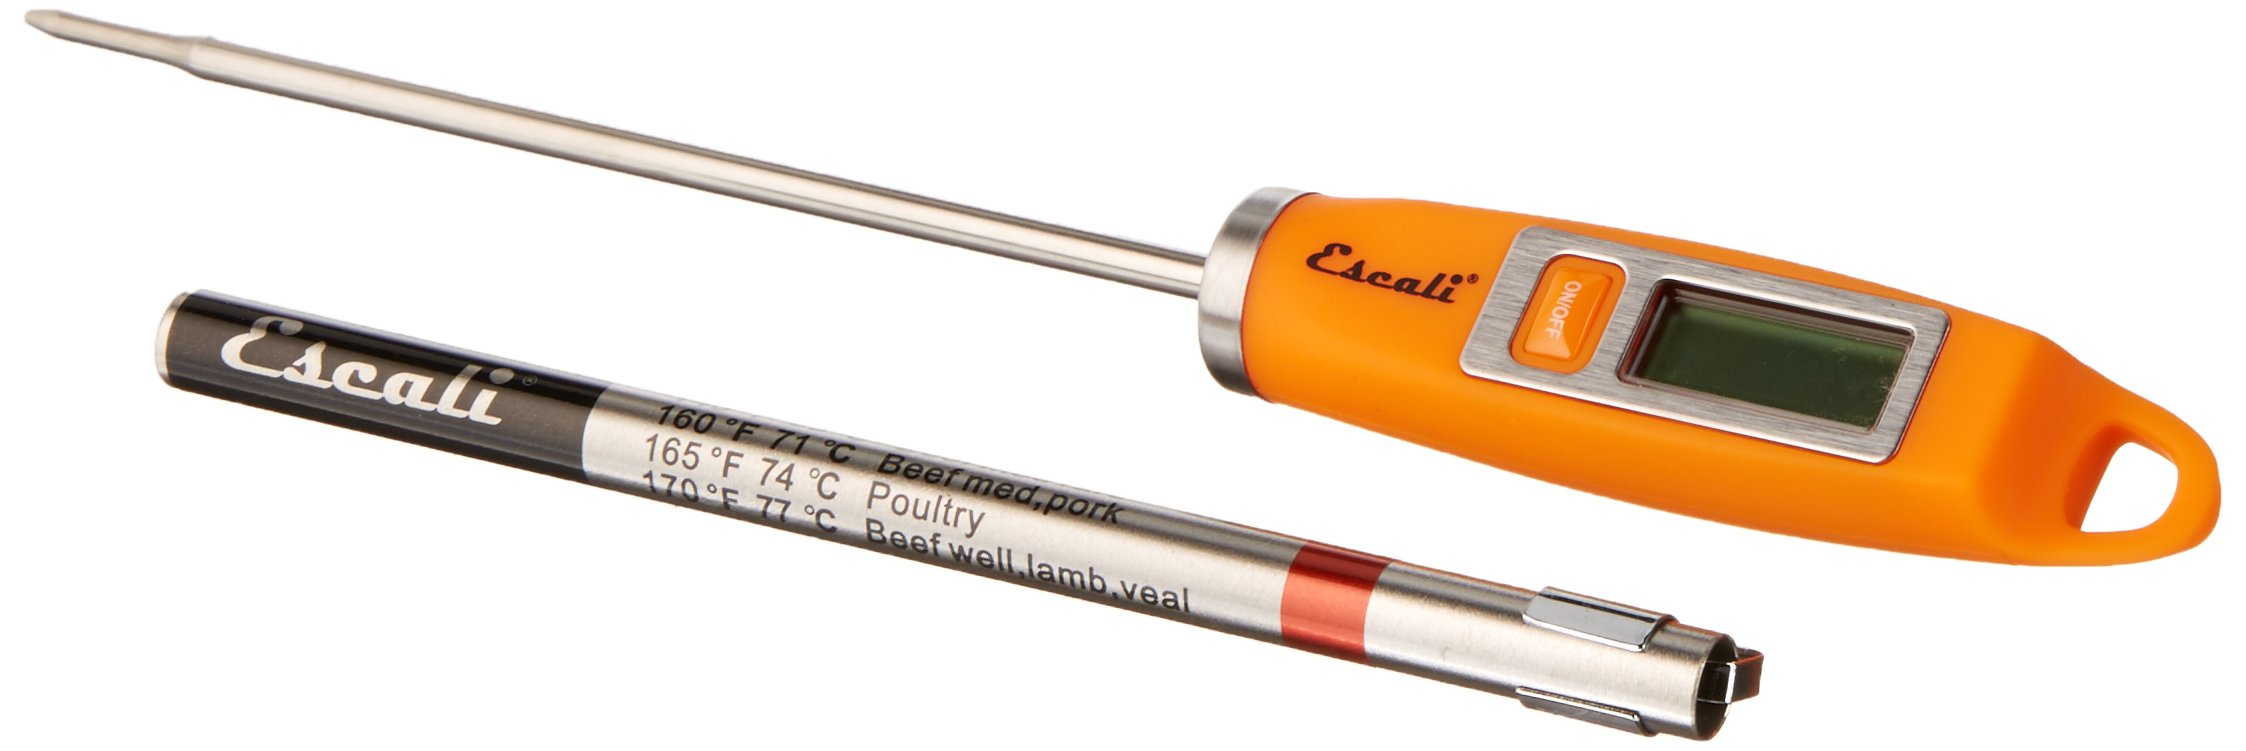 Escali DH1-O NSF Listed Gourmet Digital Thermometer, Orange